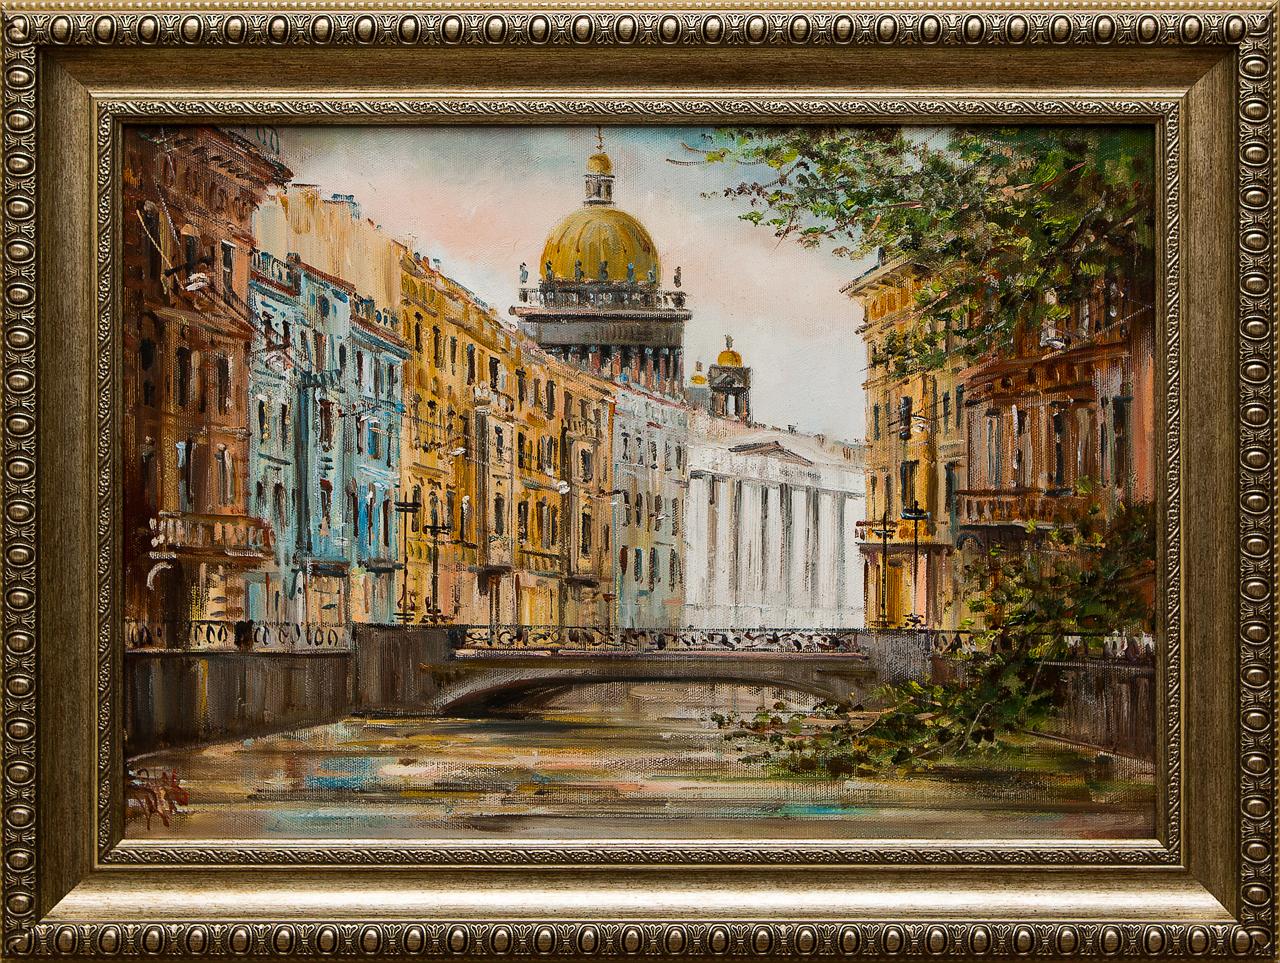 Картина маслом Мойка Шеренкова картина маслом европа шеренкова